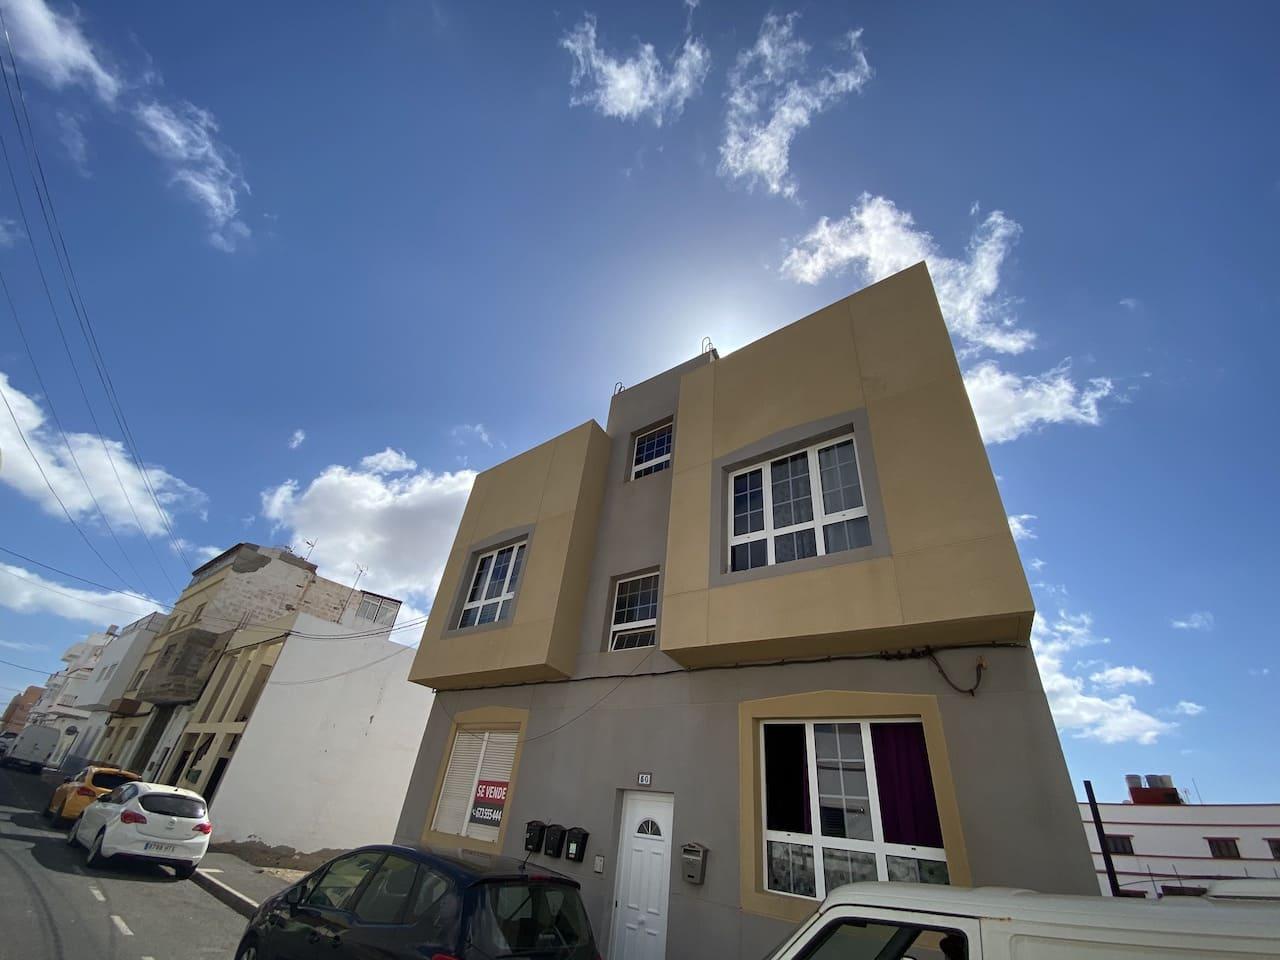 3 quarto Apartamento para venda em Puerto del Rosario - 96 354 € (Ref: 6014687)